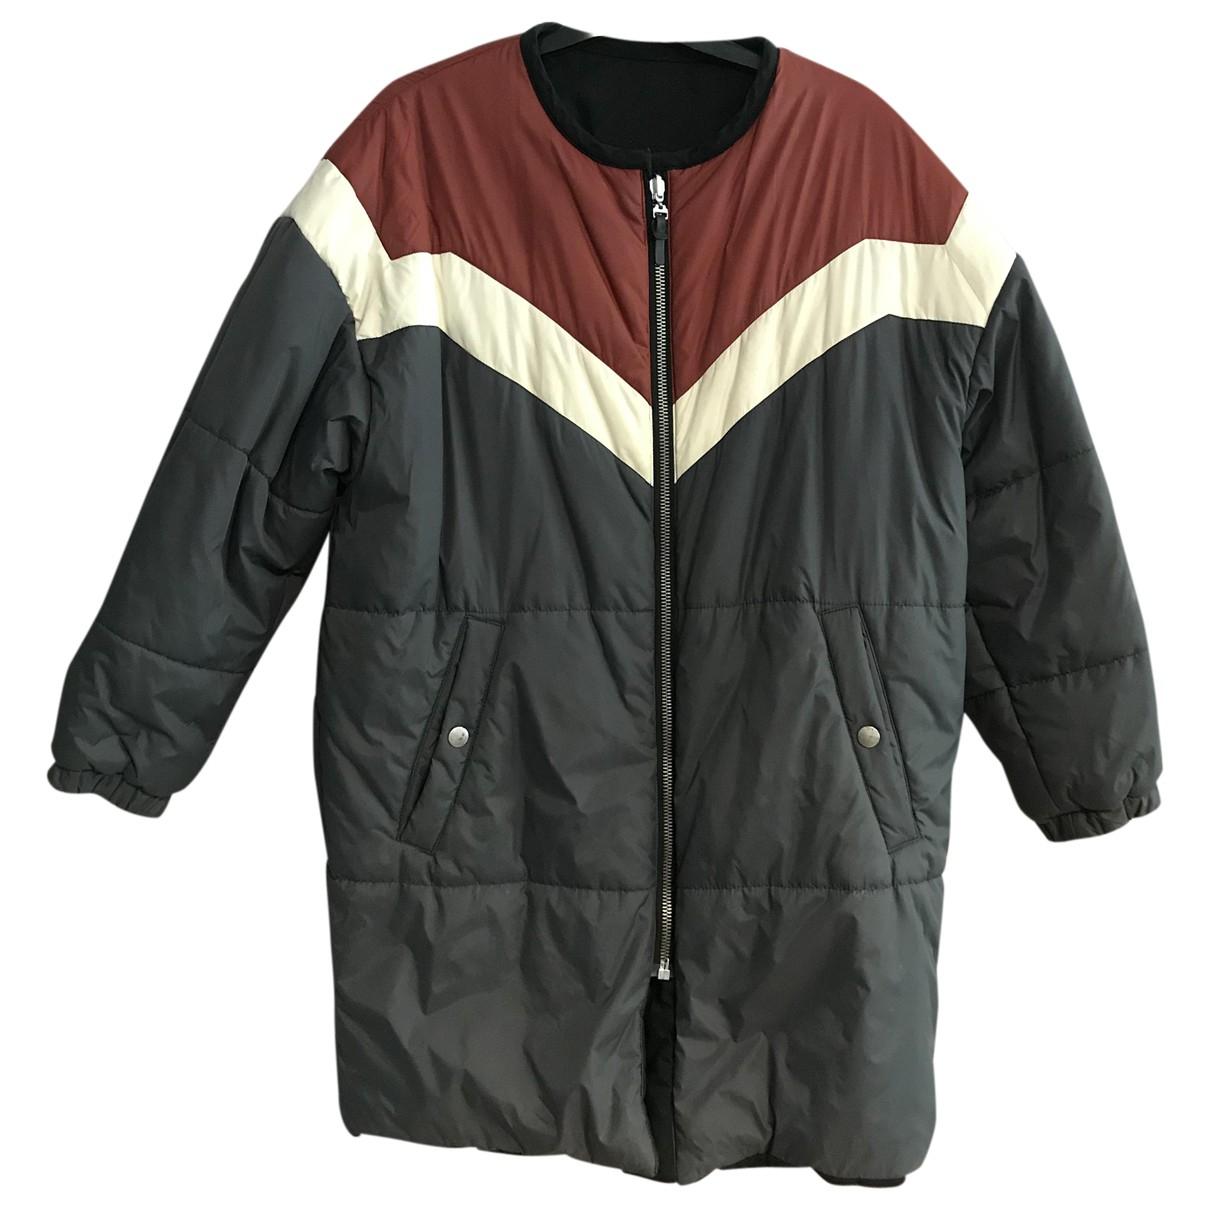 Isabel Marant N Multicolour Cotton coat for Women 38 FR